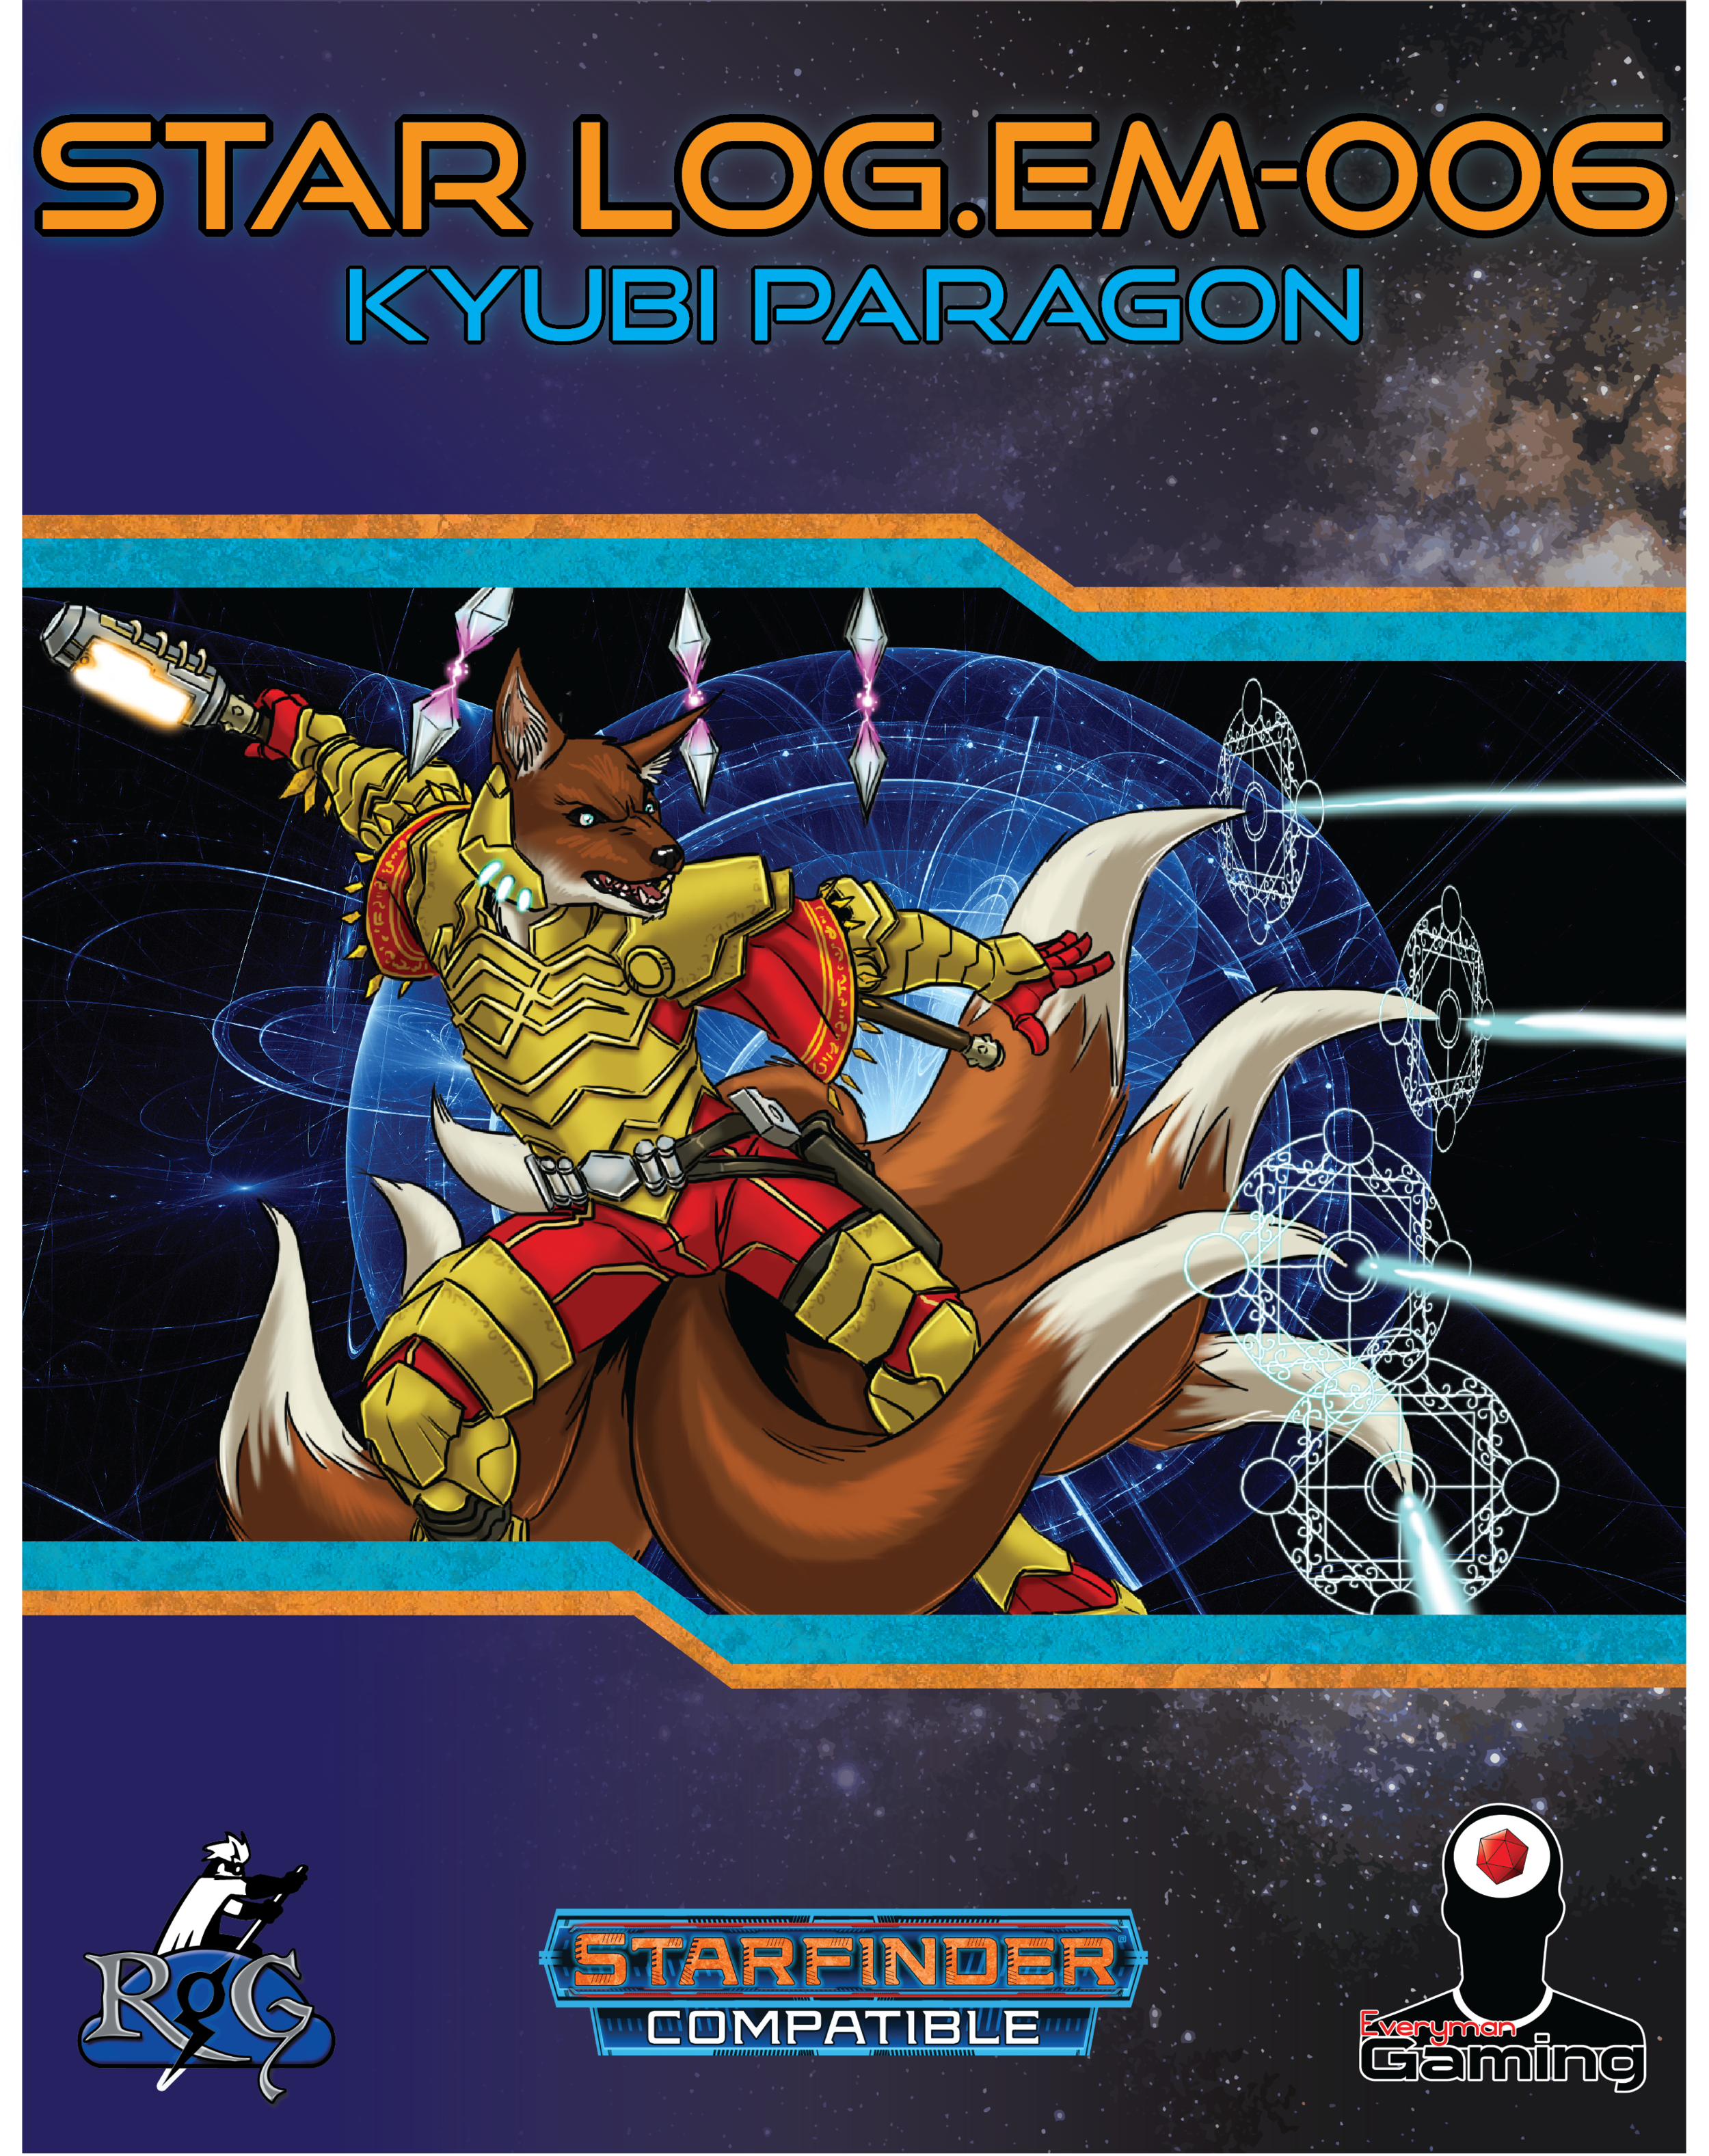 SF006 Kyubi Paragon.png